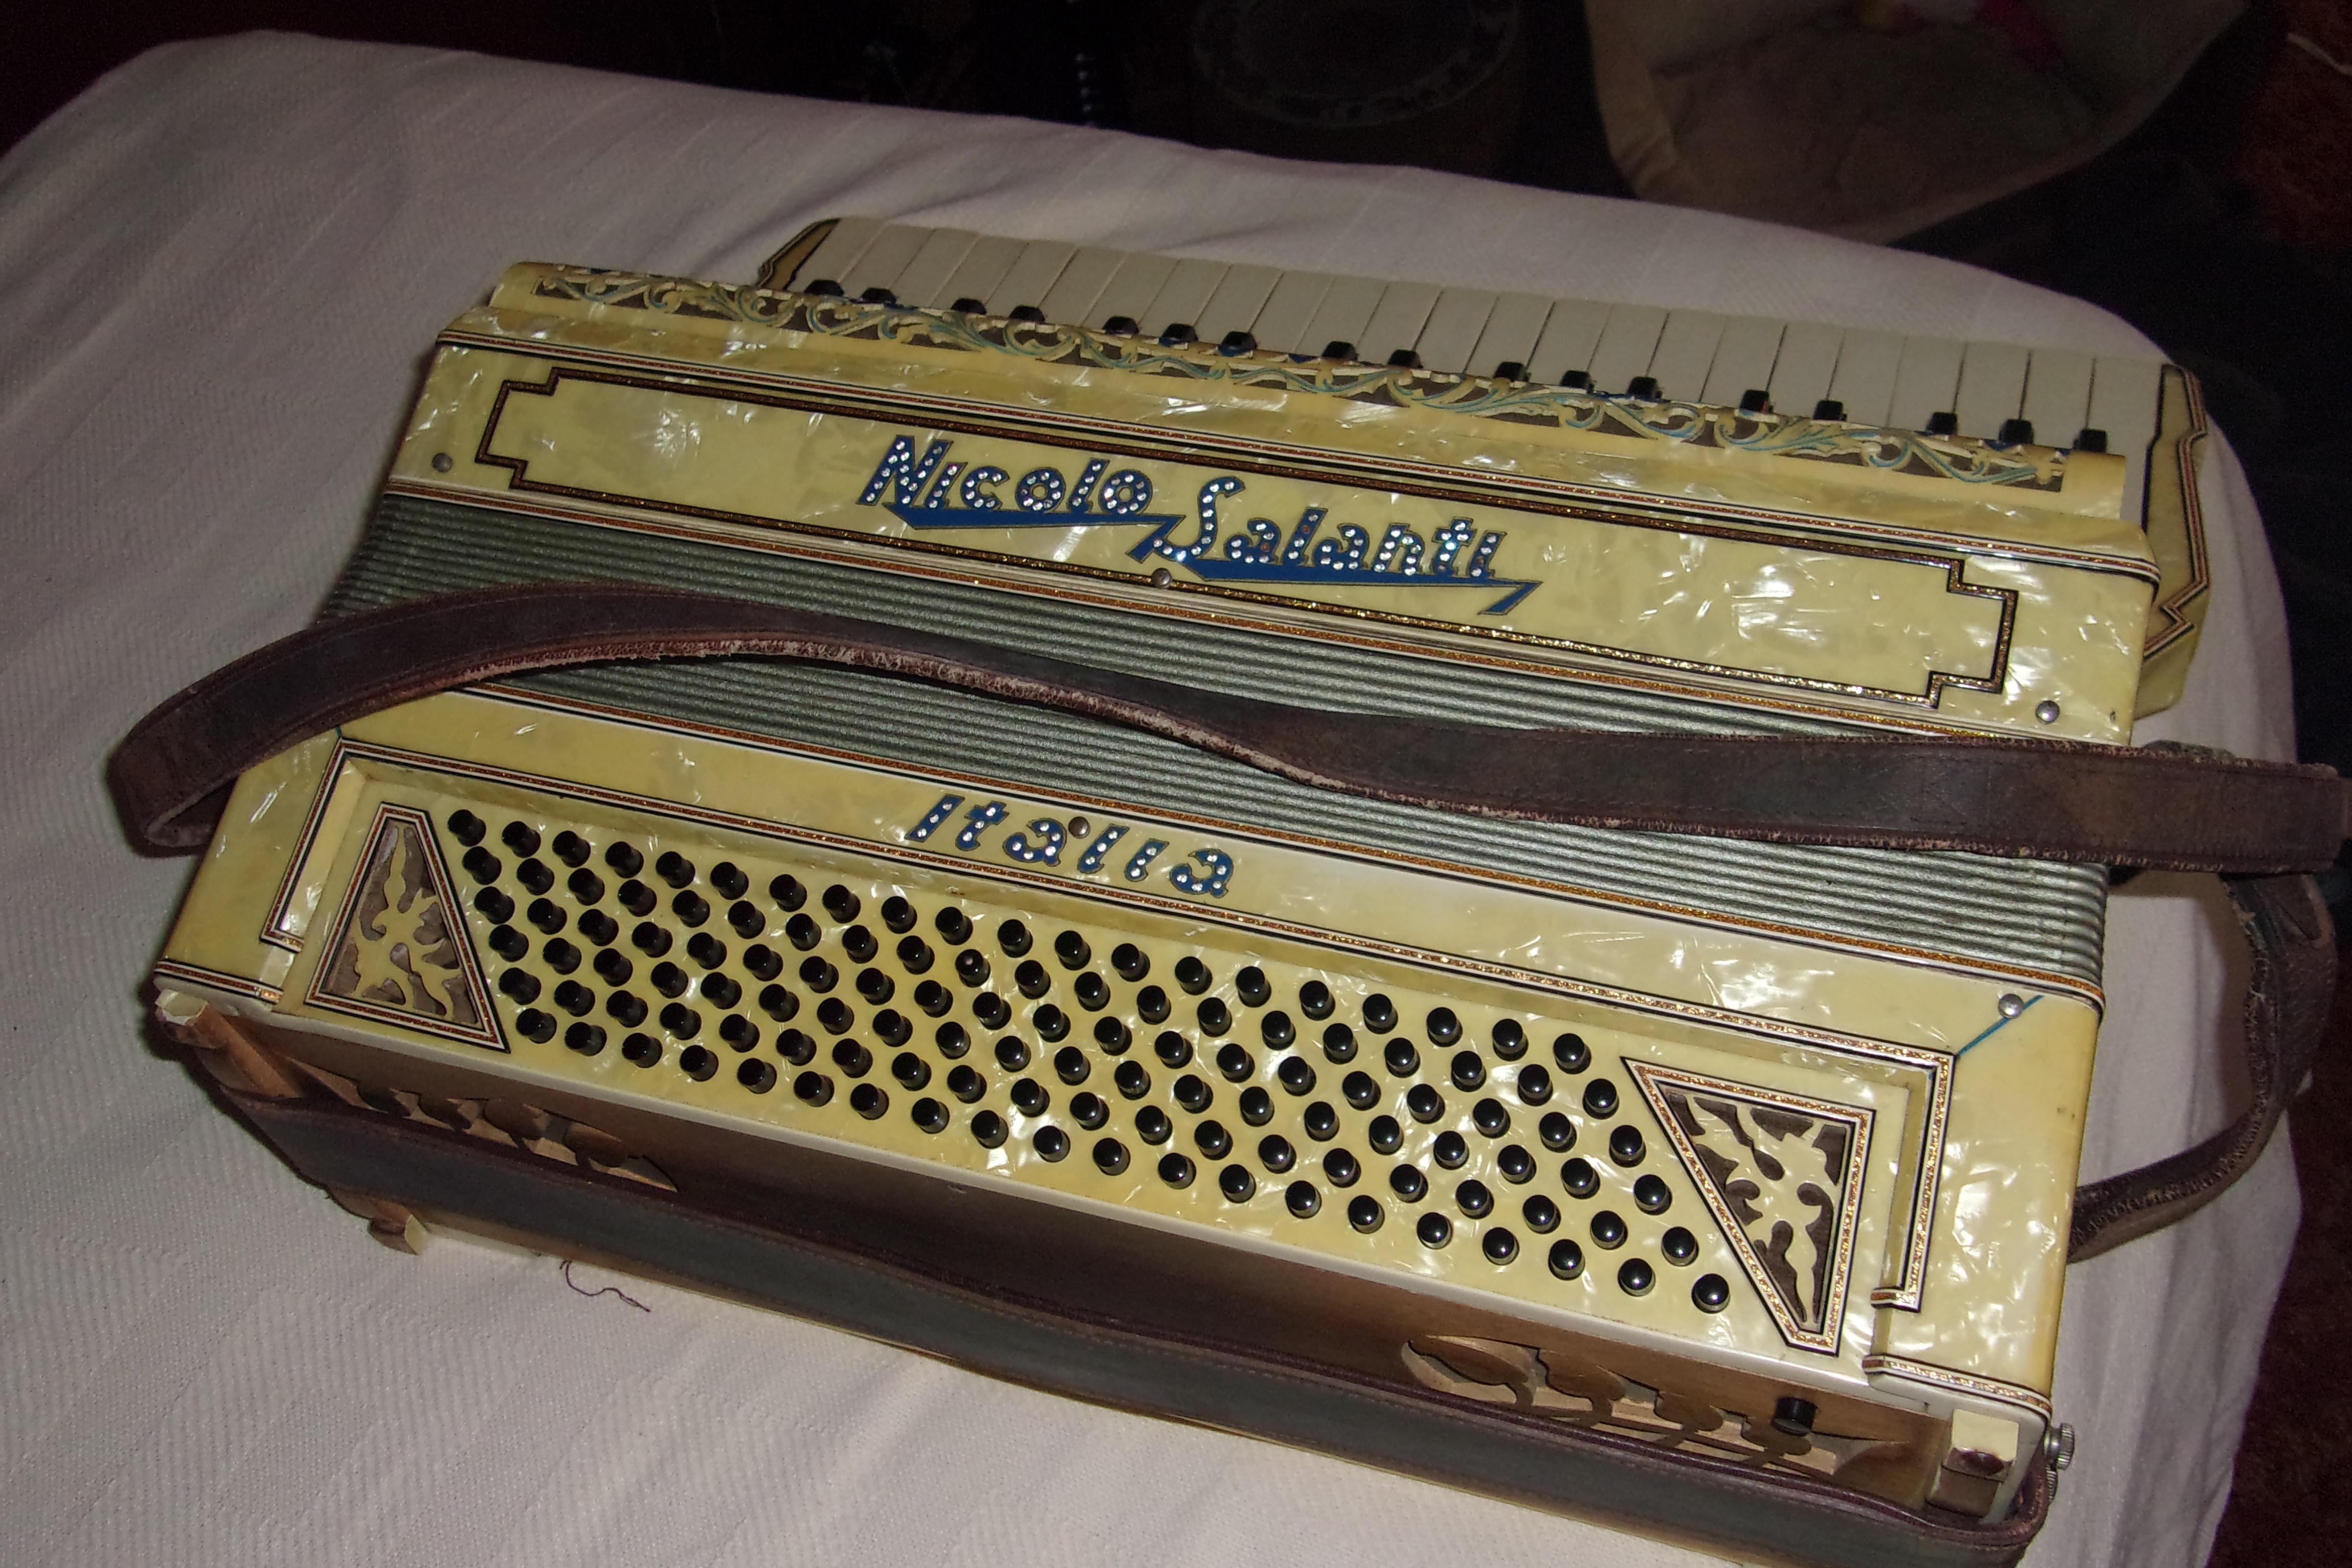 accordion antique appraisal instappraisal. Black Bedroom Furniture Sets. Home Design Ideas